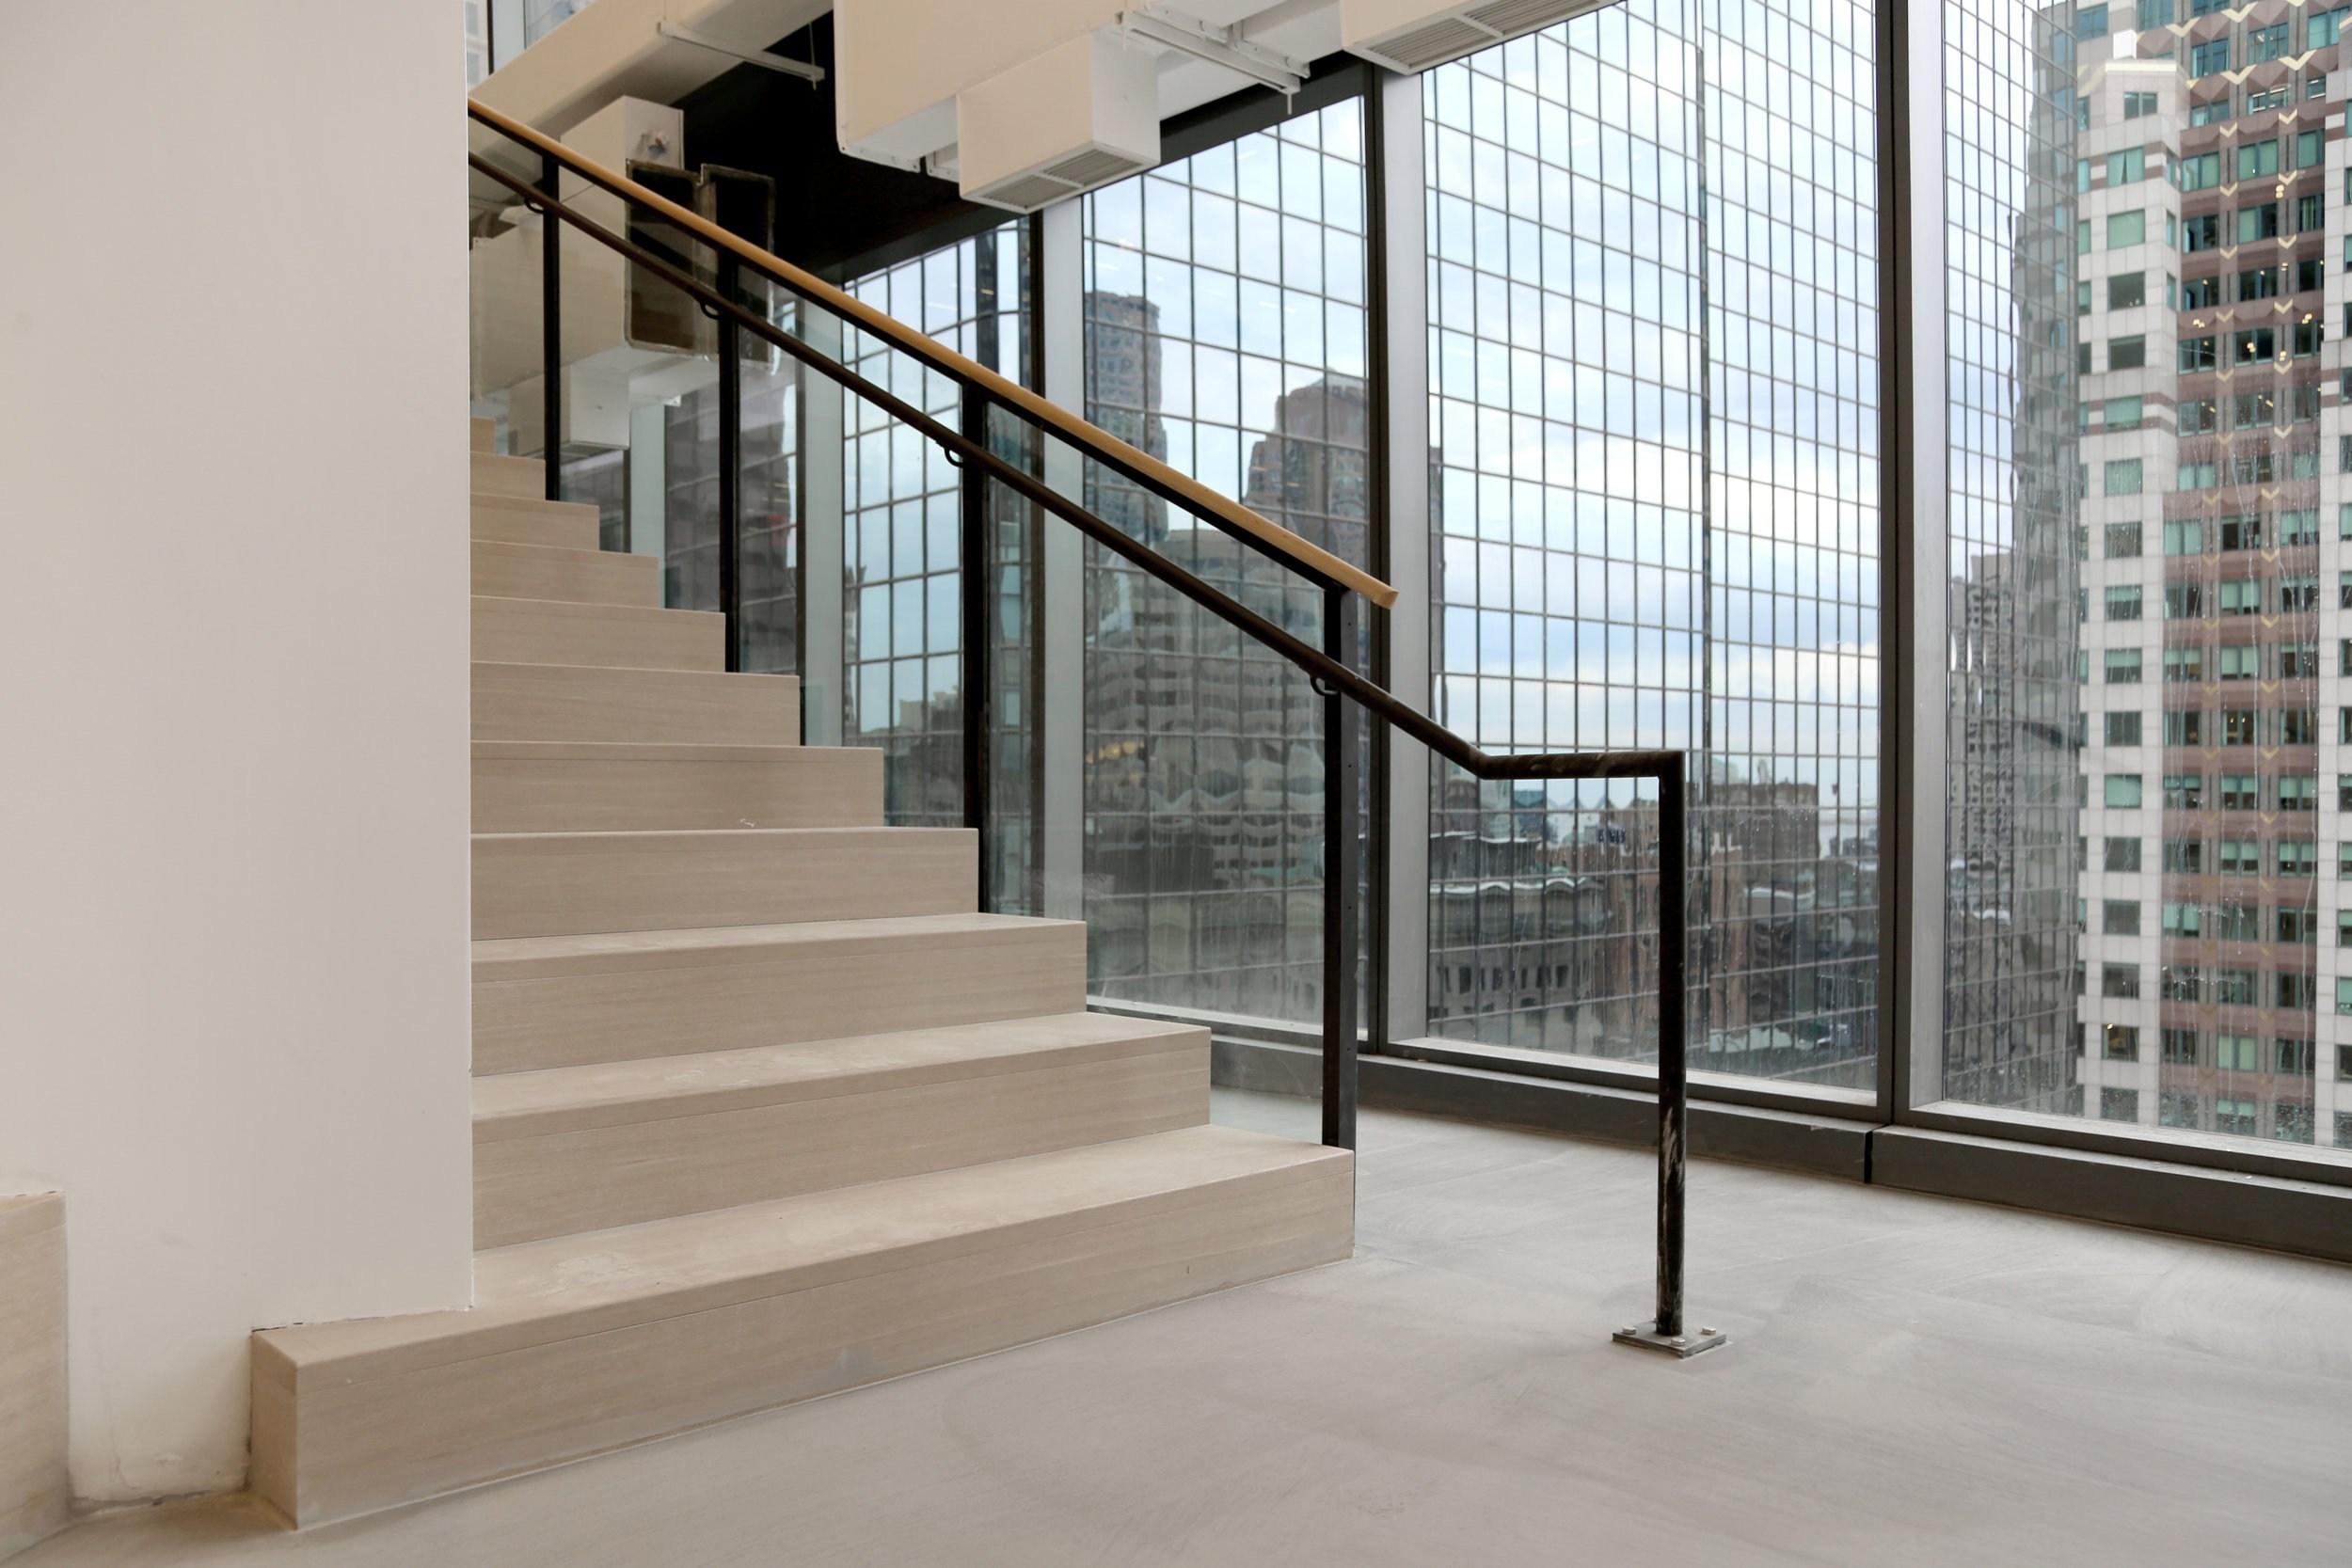 Digitas Staircase — Spaceworks Ai   Black Iron Stair Railing   Industrial   Iron Baluster   Rectangular Iron   Horizontal   Contemporary